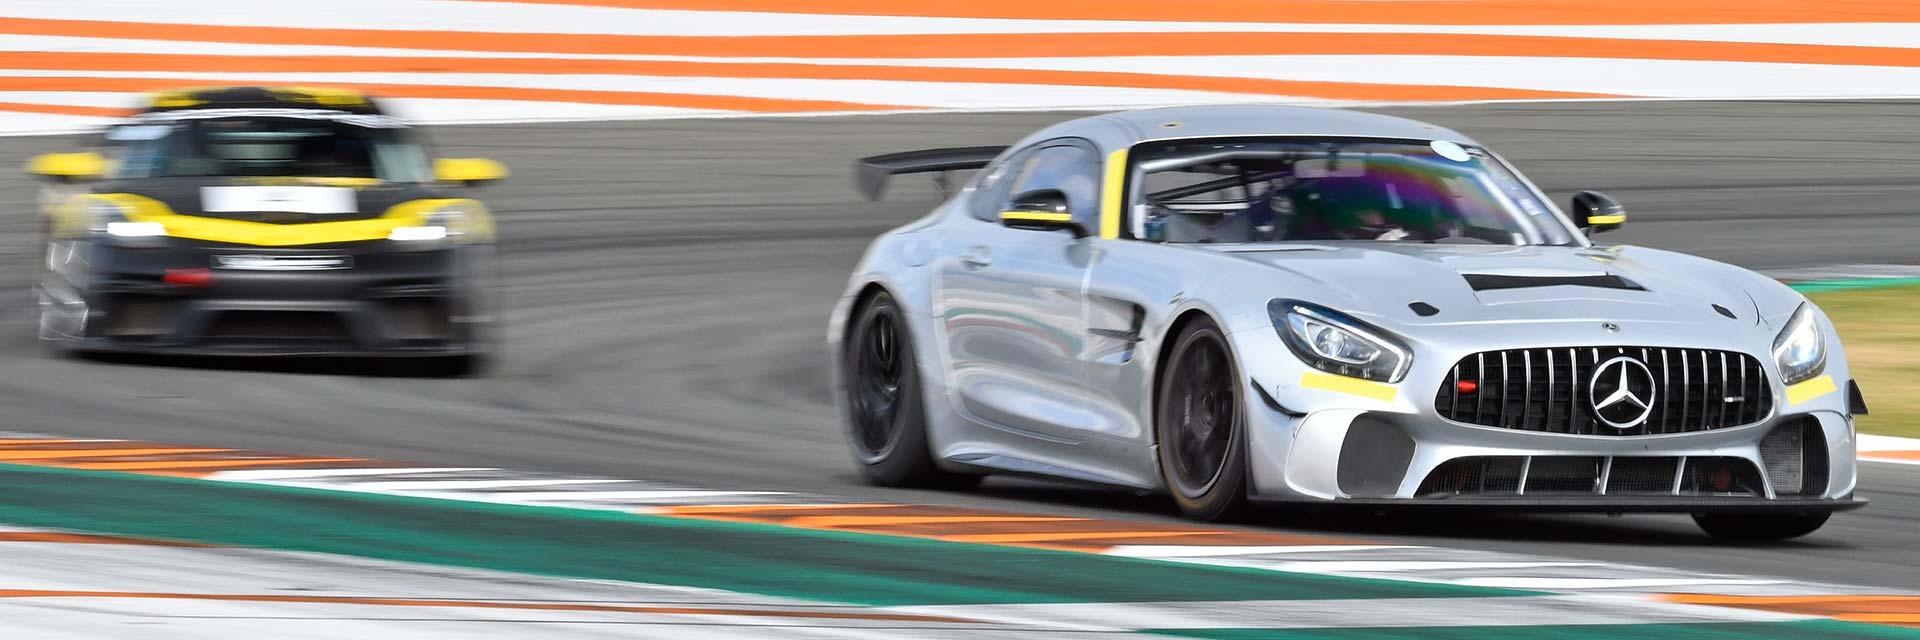 GEDLICH Racing - Racetrack Motorland Aragon